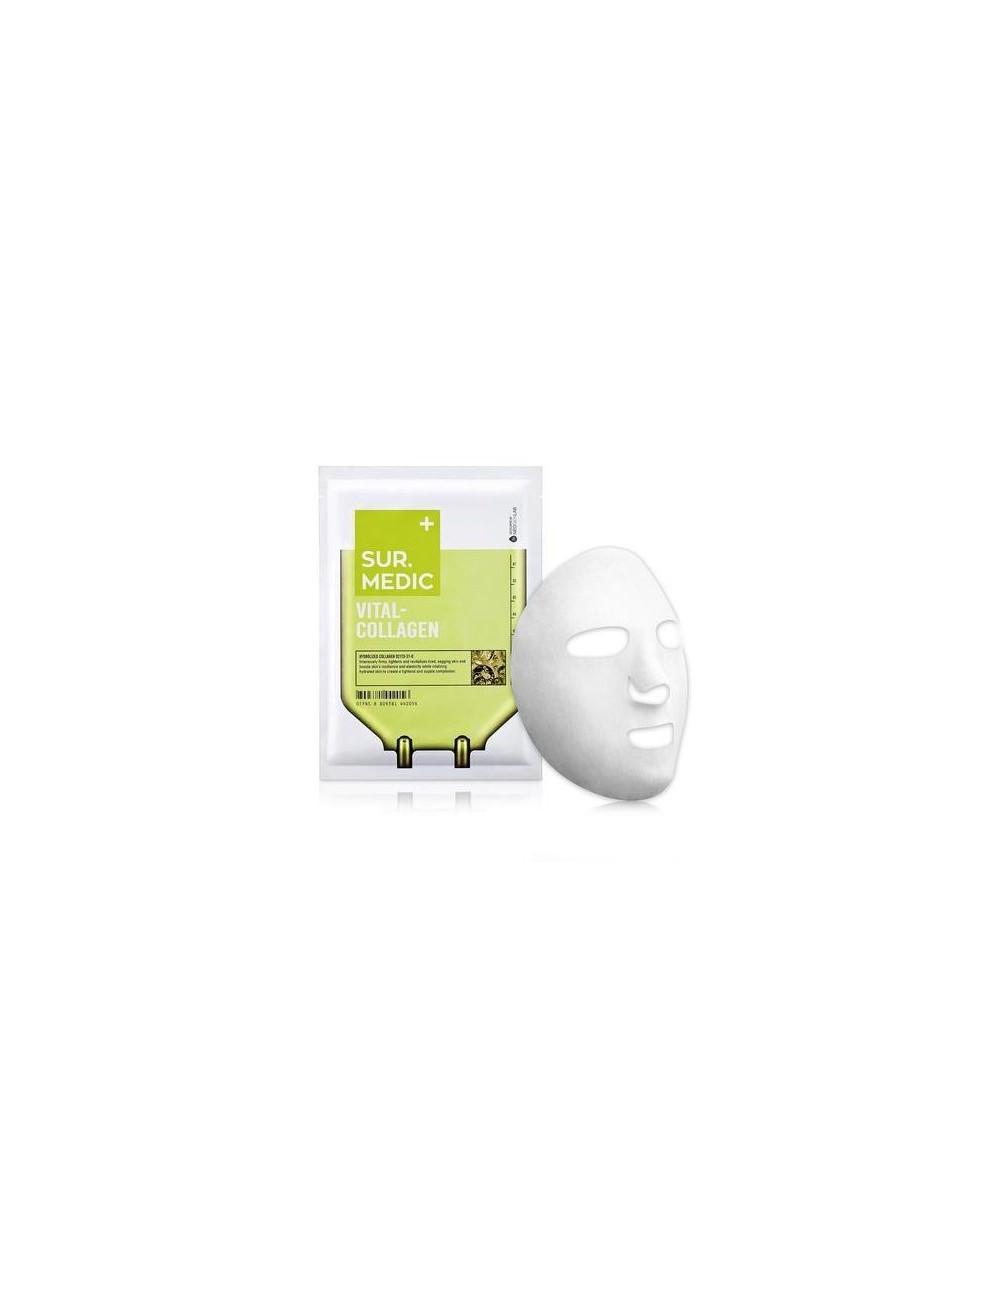 Mascarilla Reafirmante NEOGEN Sur. Medic Vital-collagen Mask